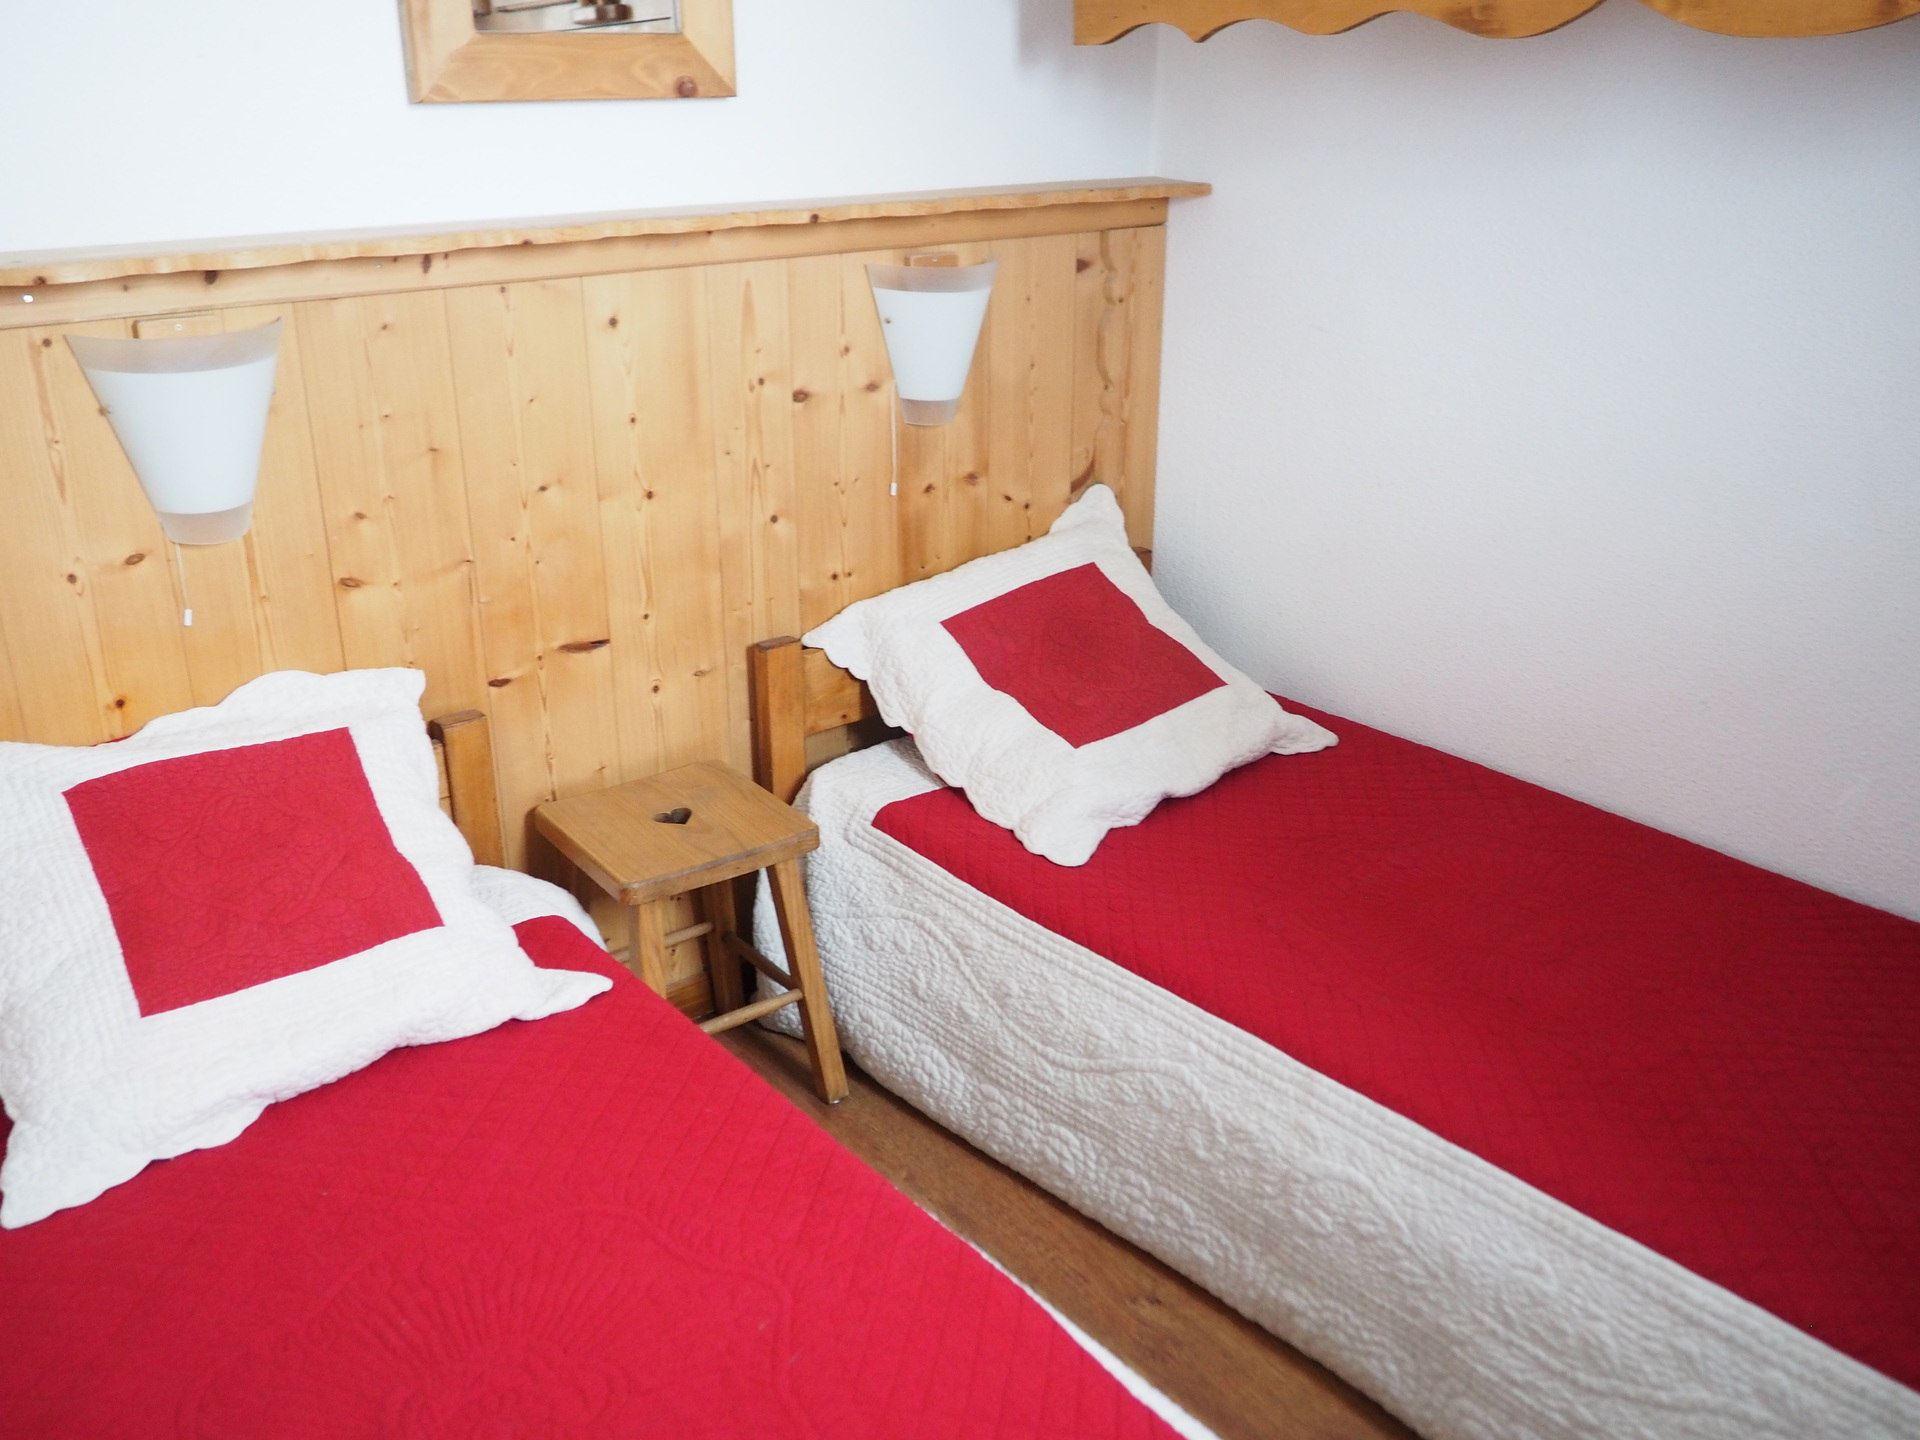 2 Pièces cabine 5 Pers skis aux pieds / BALCONS D'OLYMPIE 104